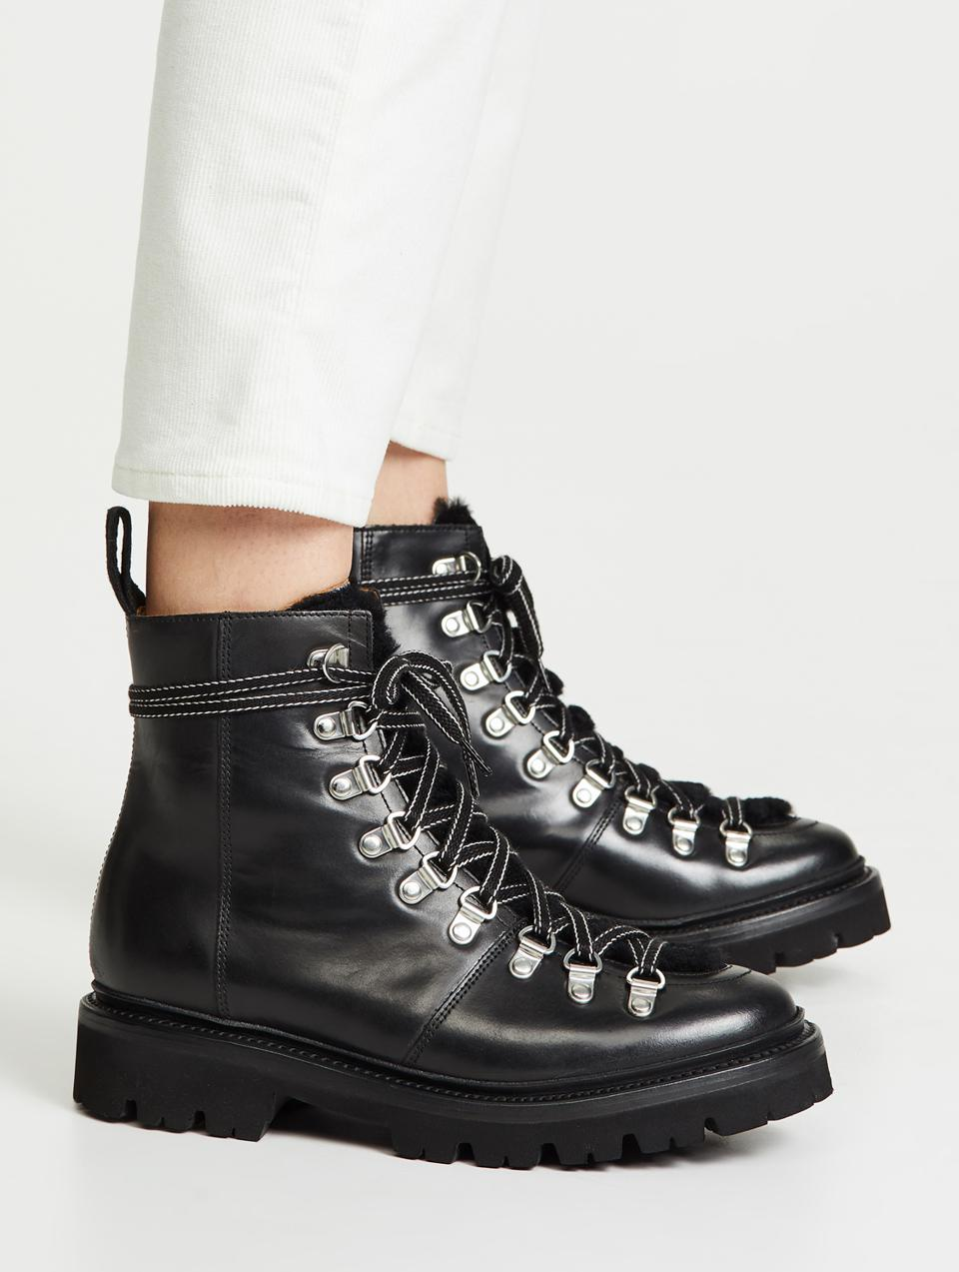 Grenson_Best Womens Winter Boots